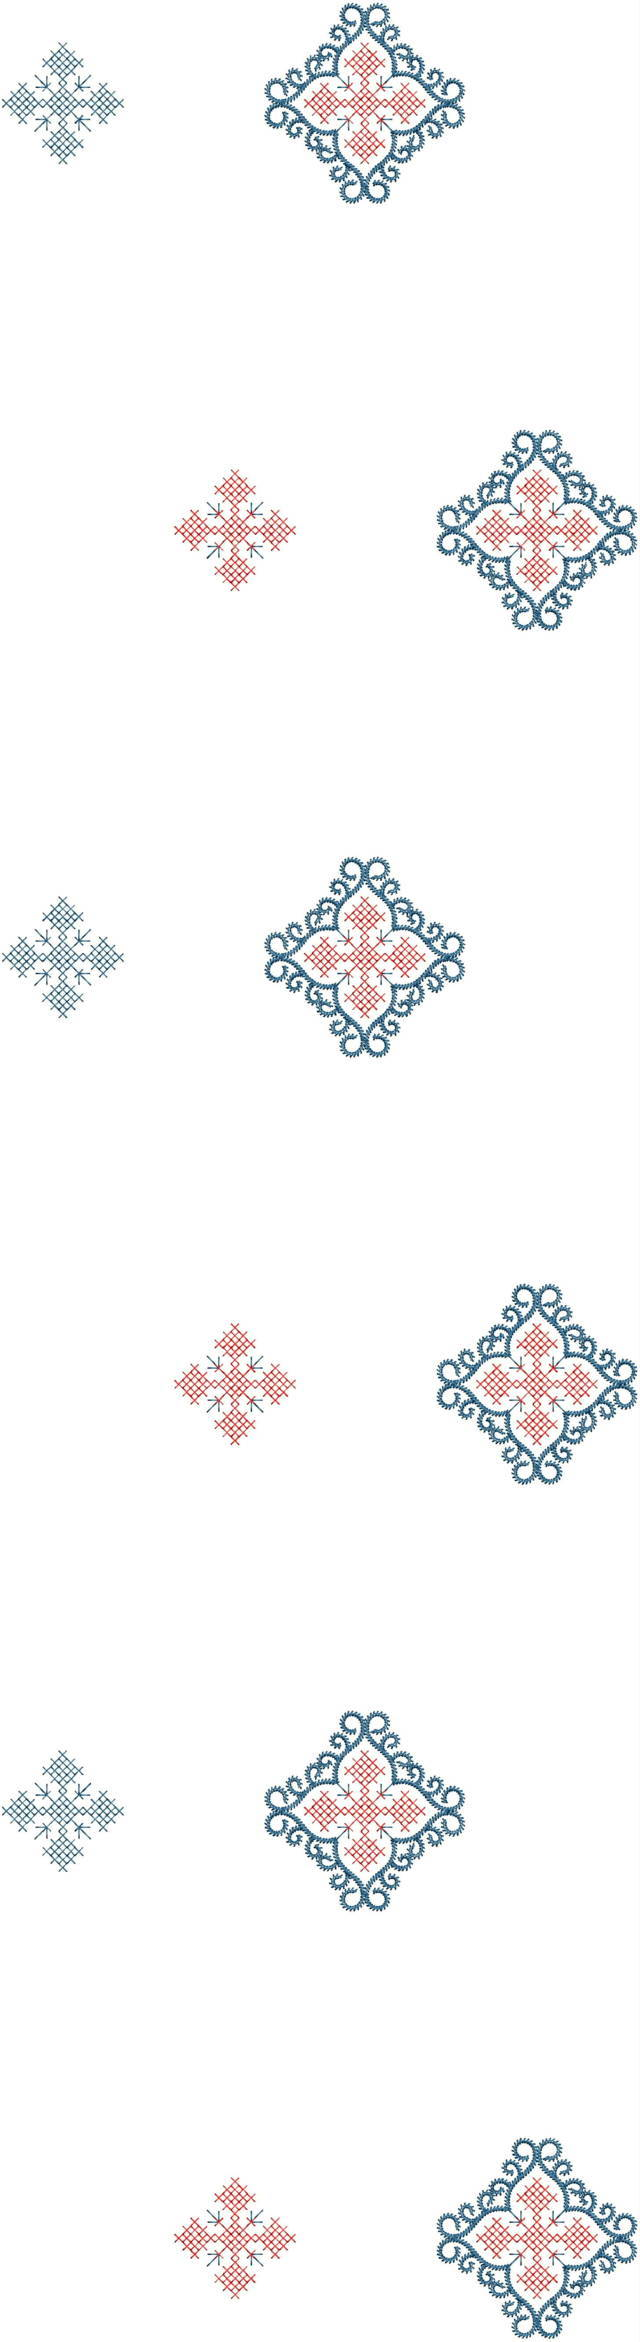 Cross stitch concept duptta embroidery design